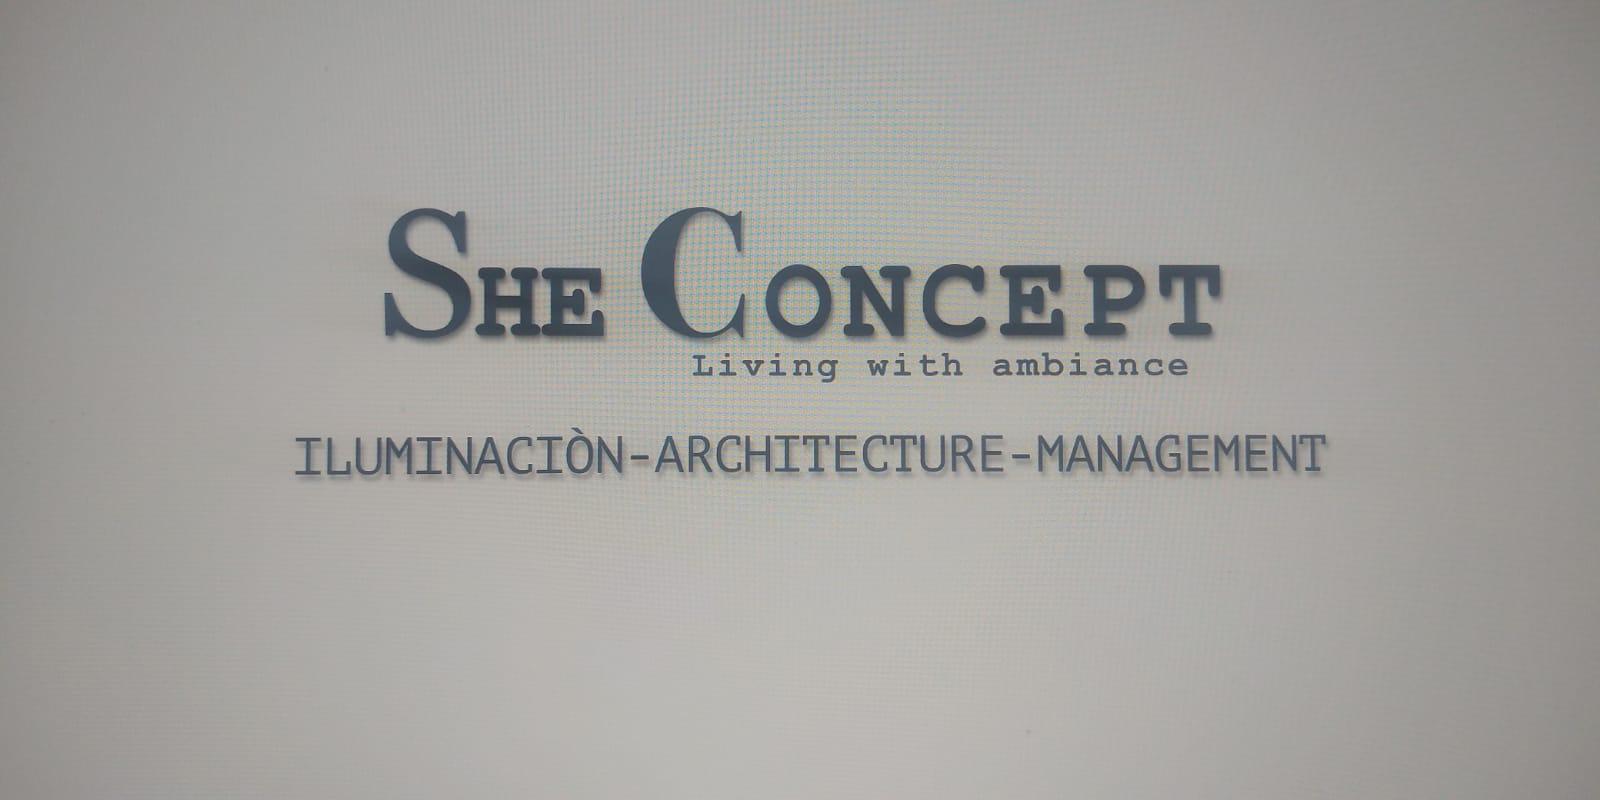 She Concept